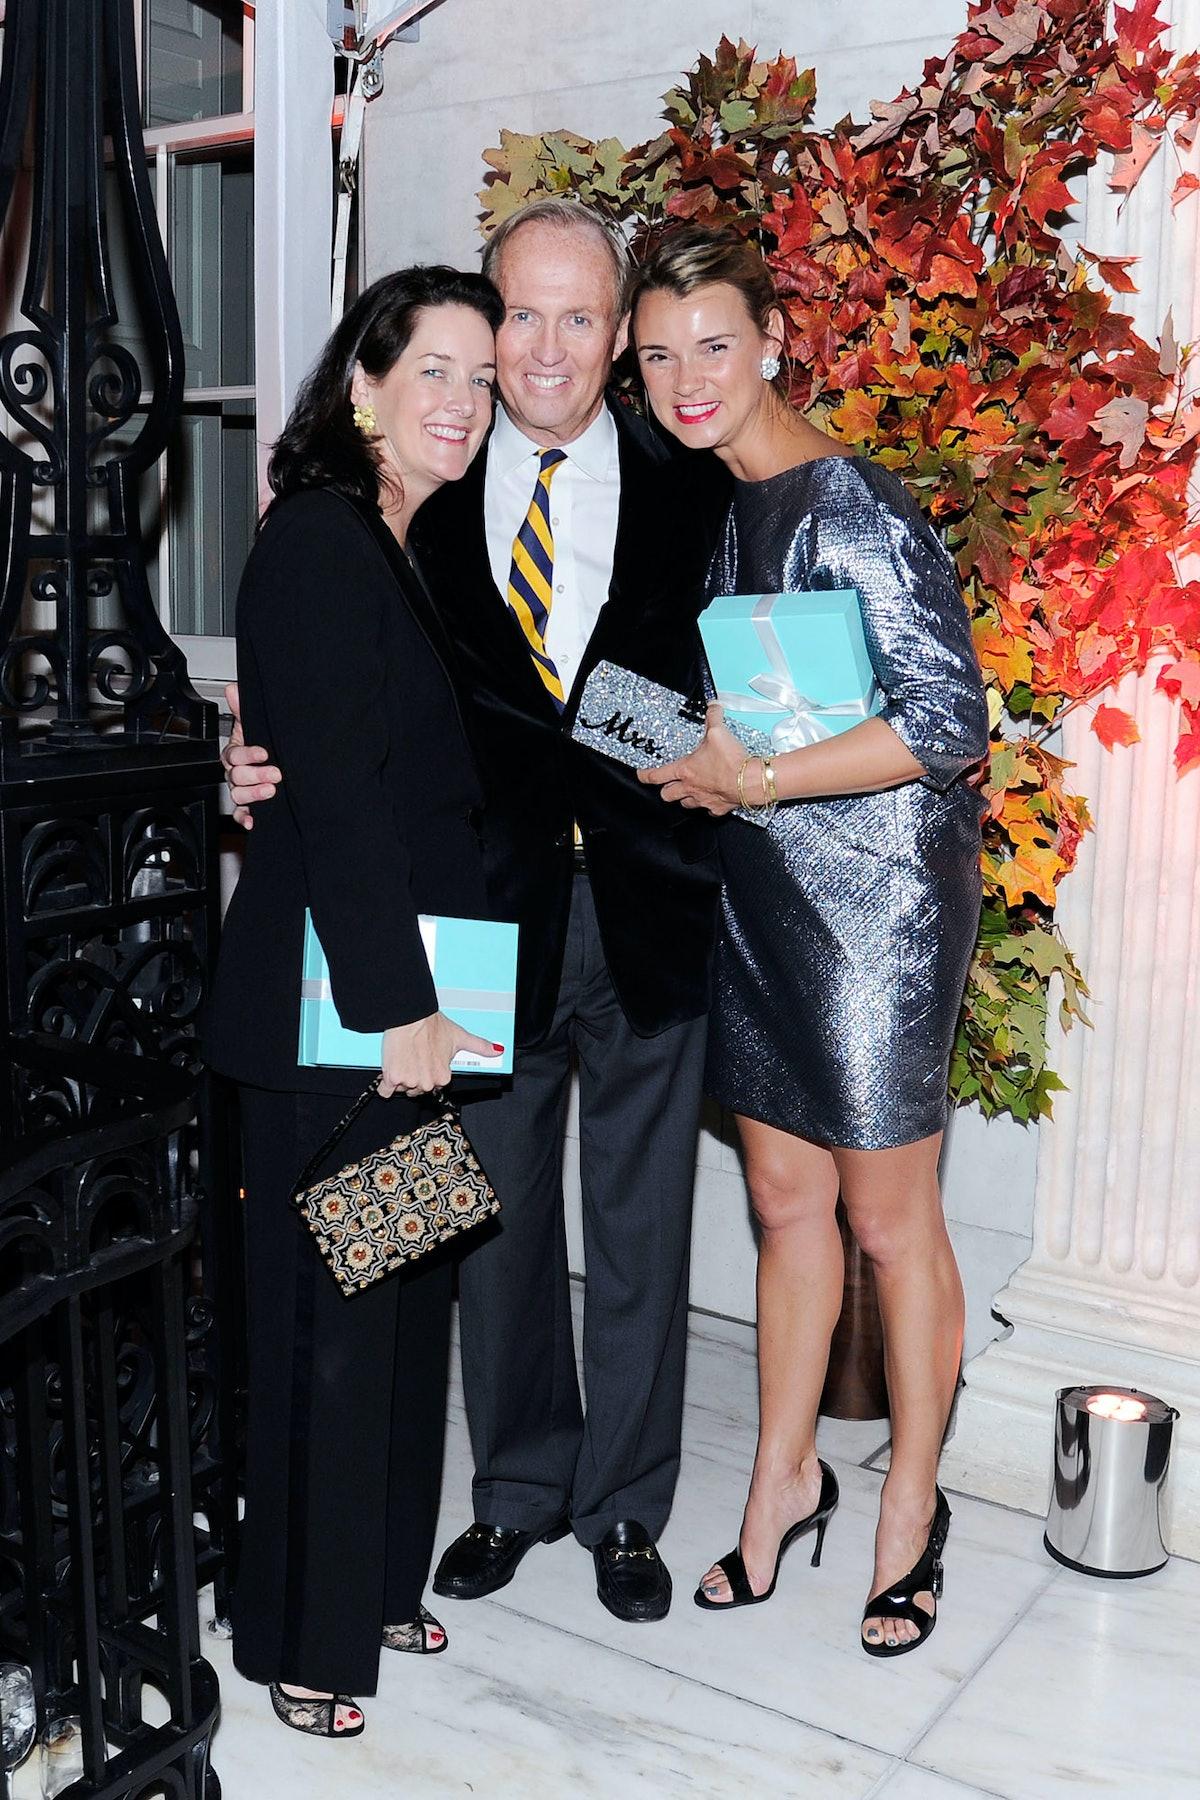 Tara Rockefeller, Mark Gilbertson, and Allison Aston